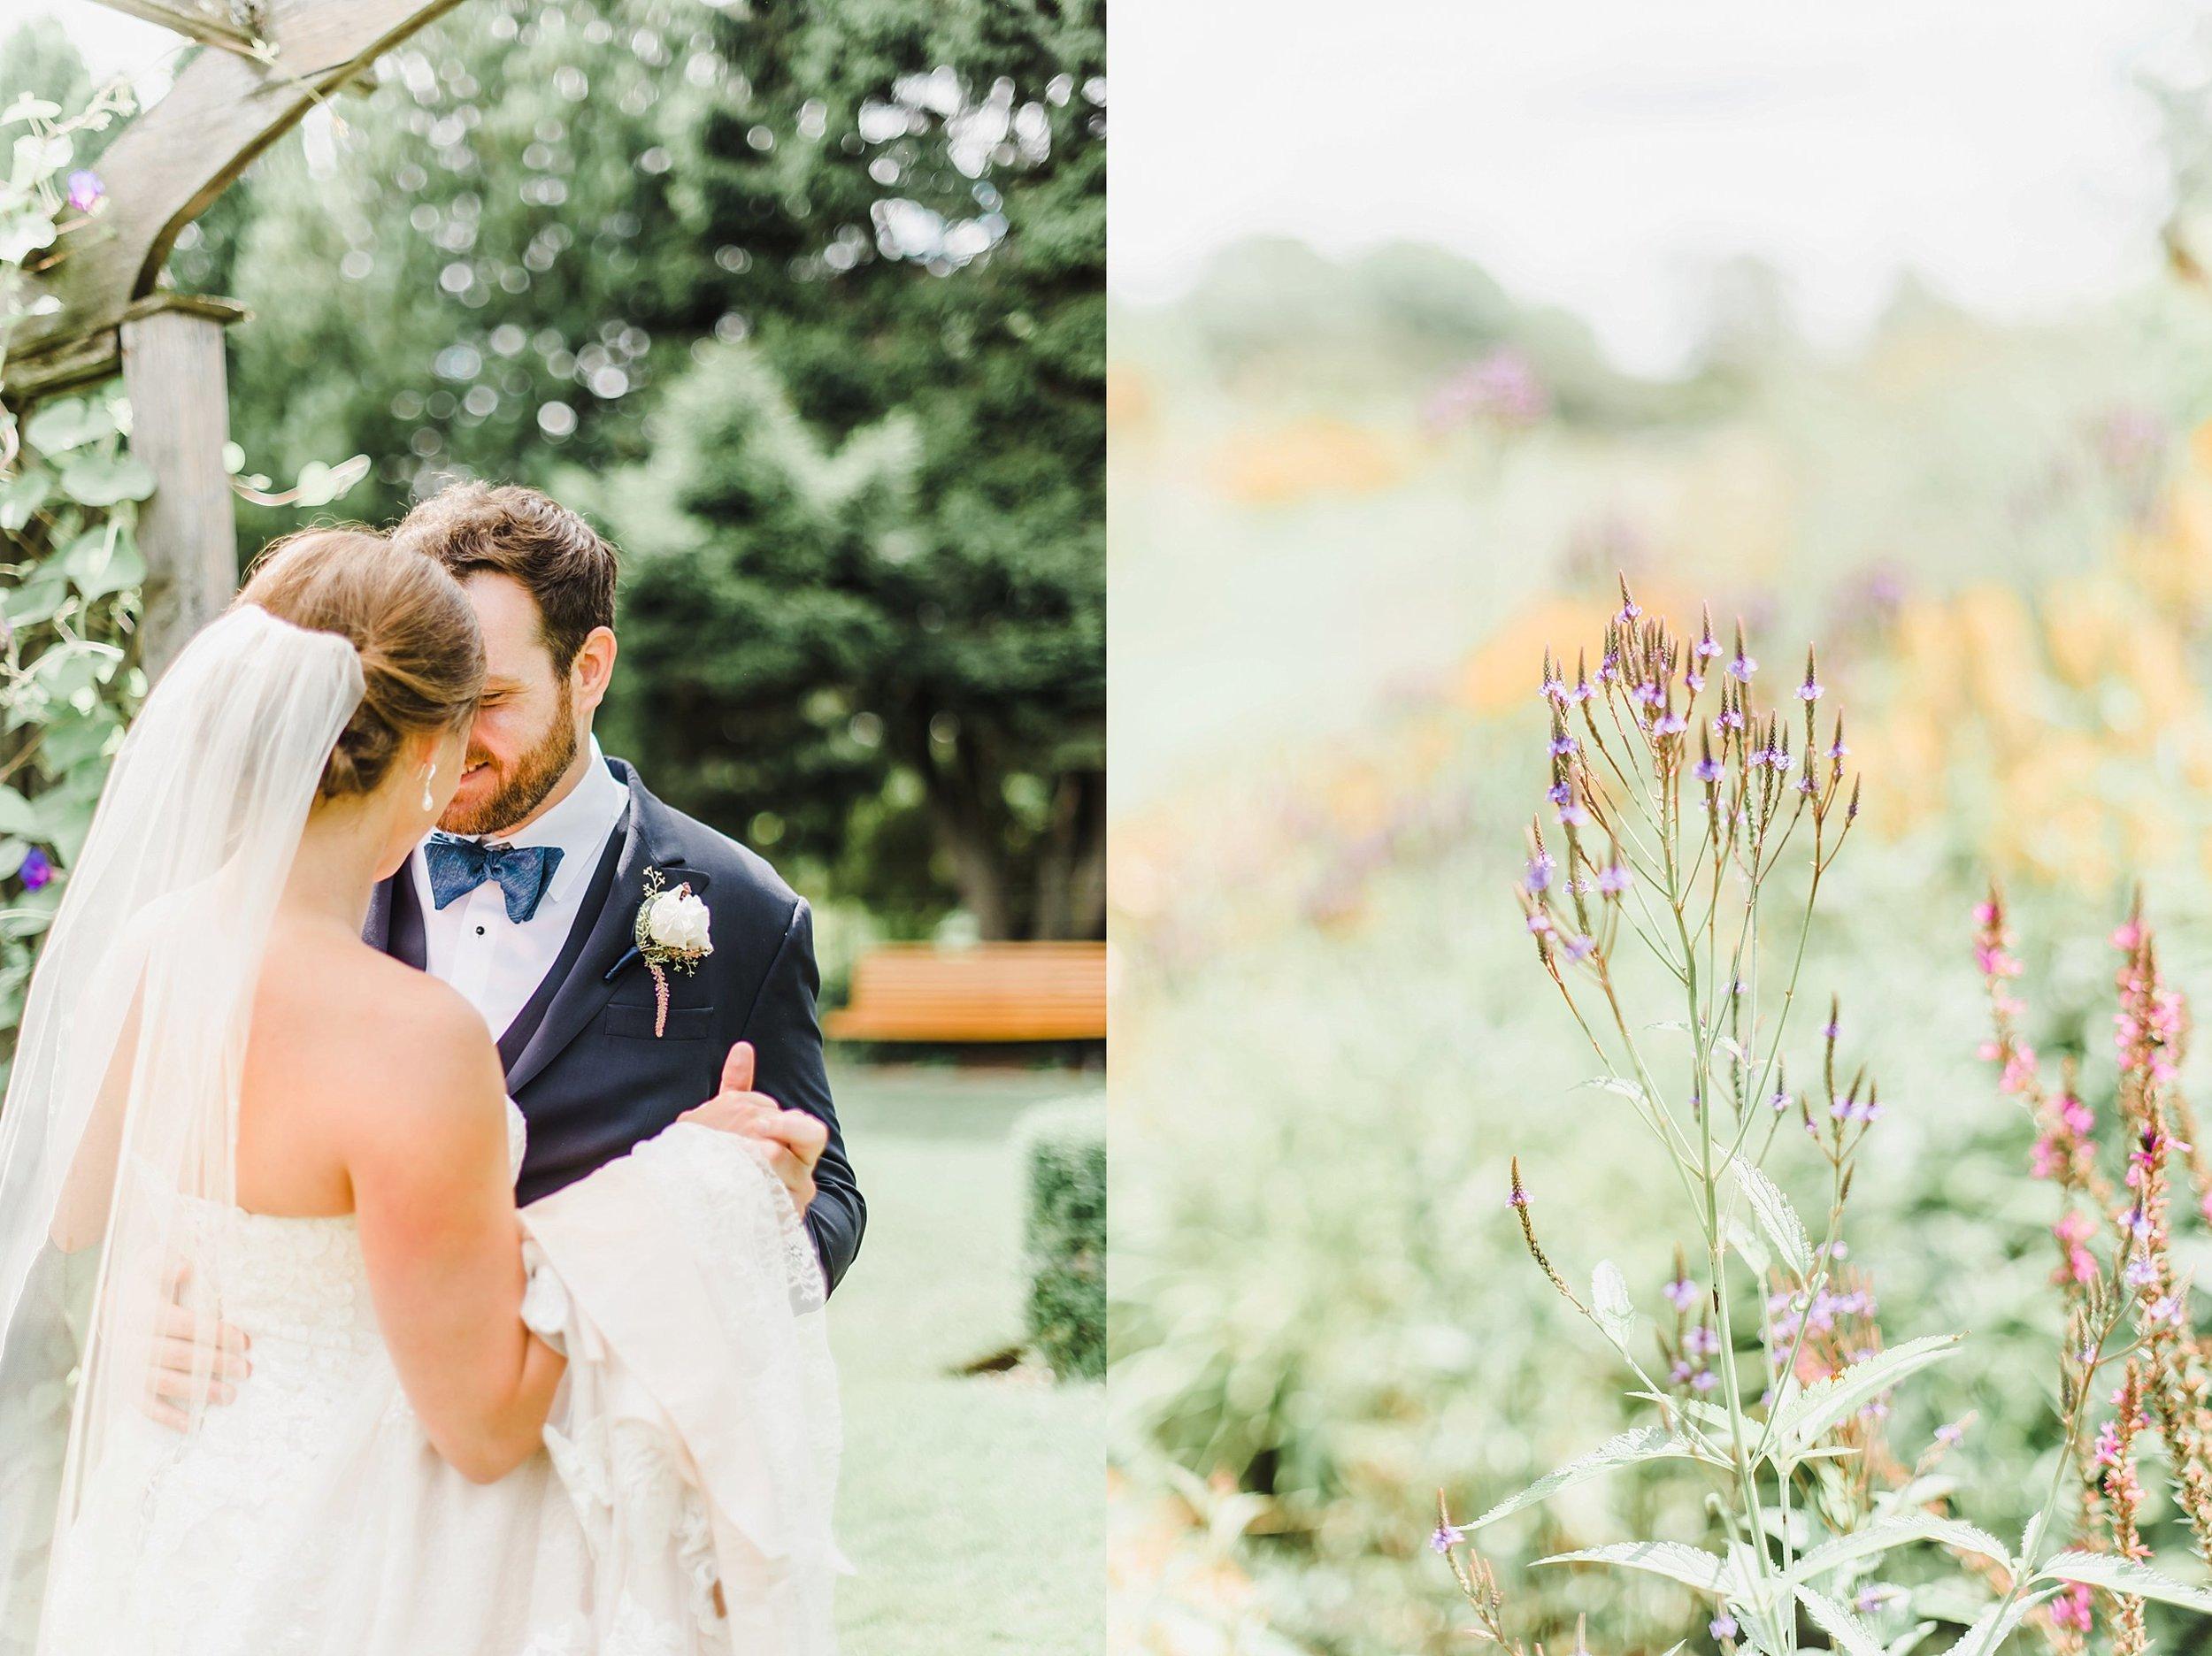 light airy indie fine art ottawa wedding photographer   Ali and Batoul Photography_1011.jpg